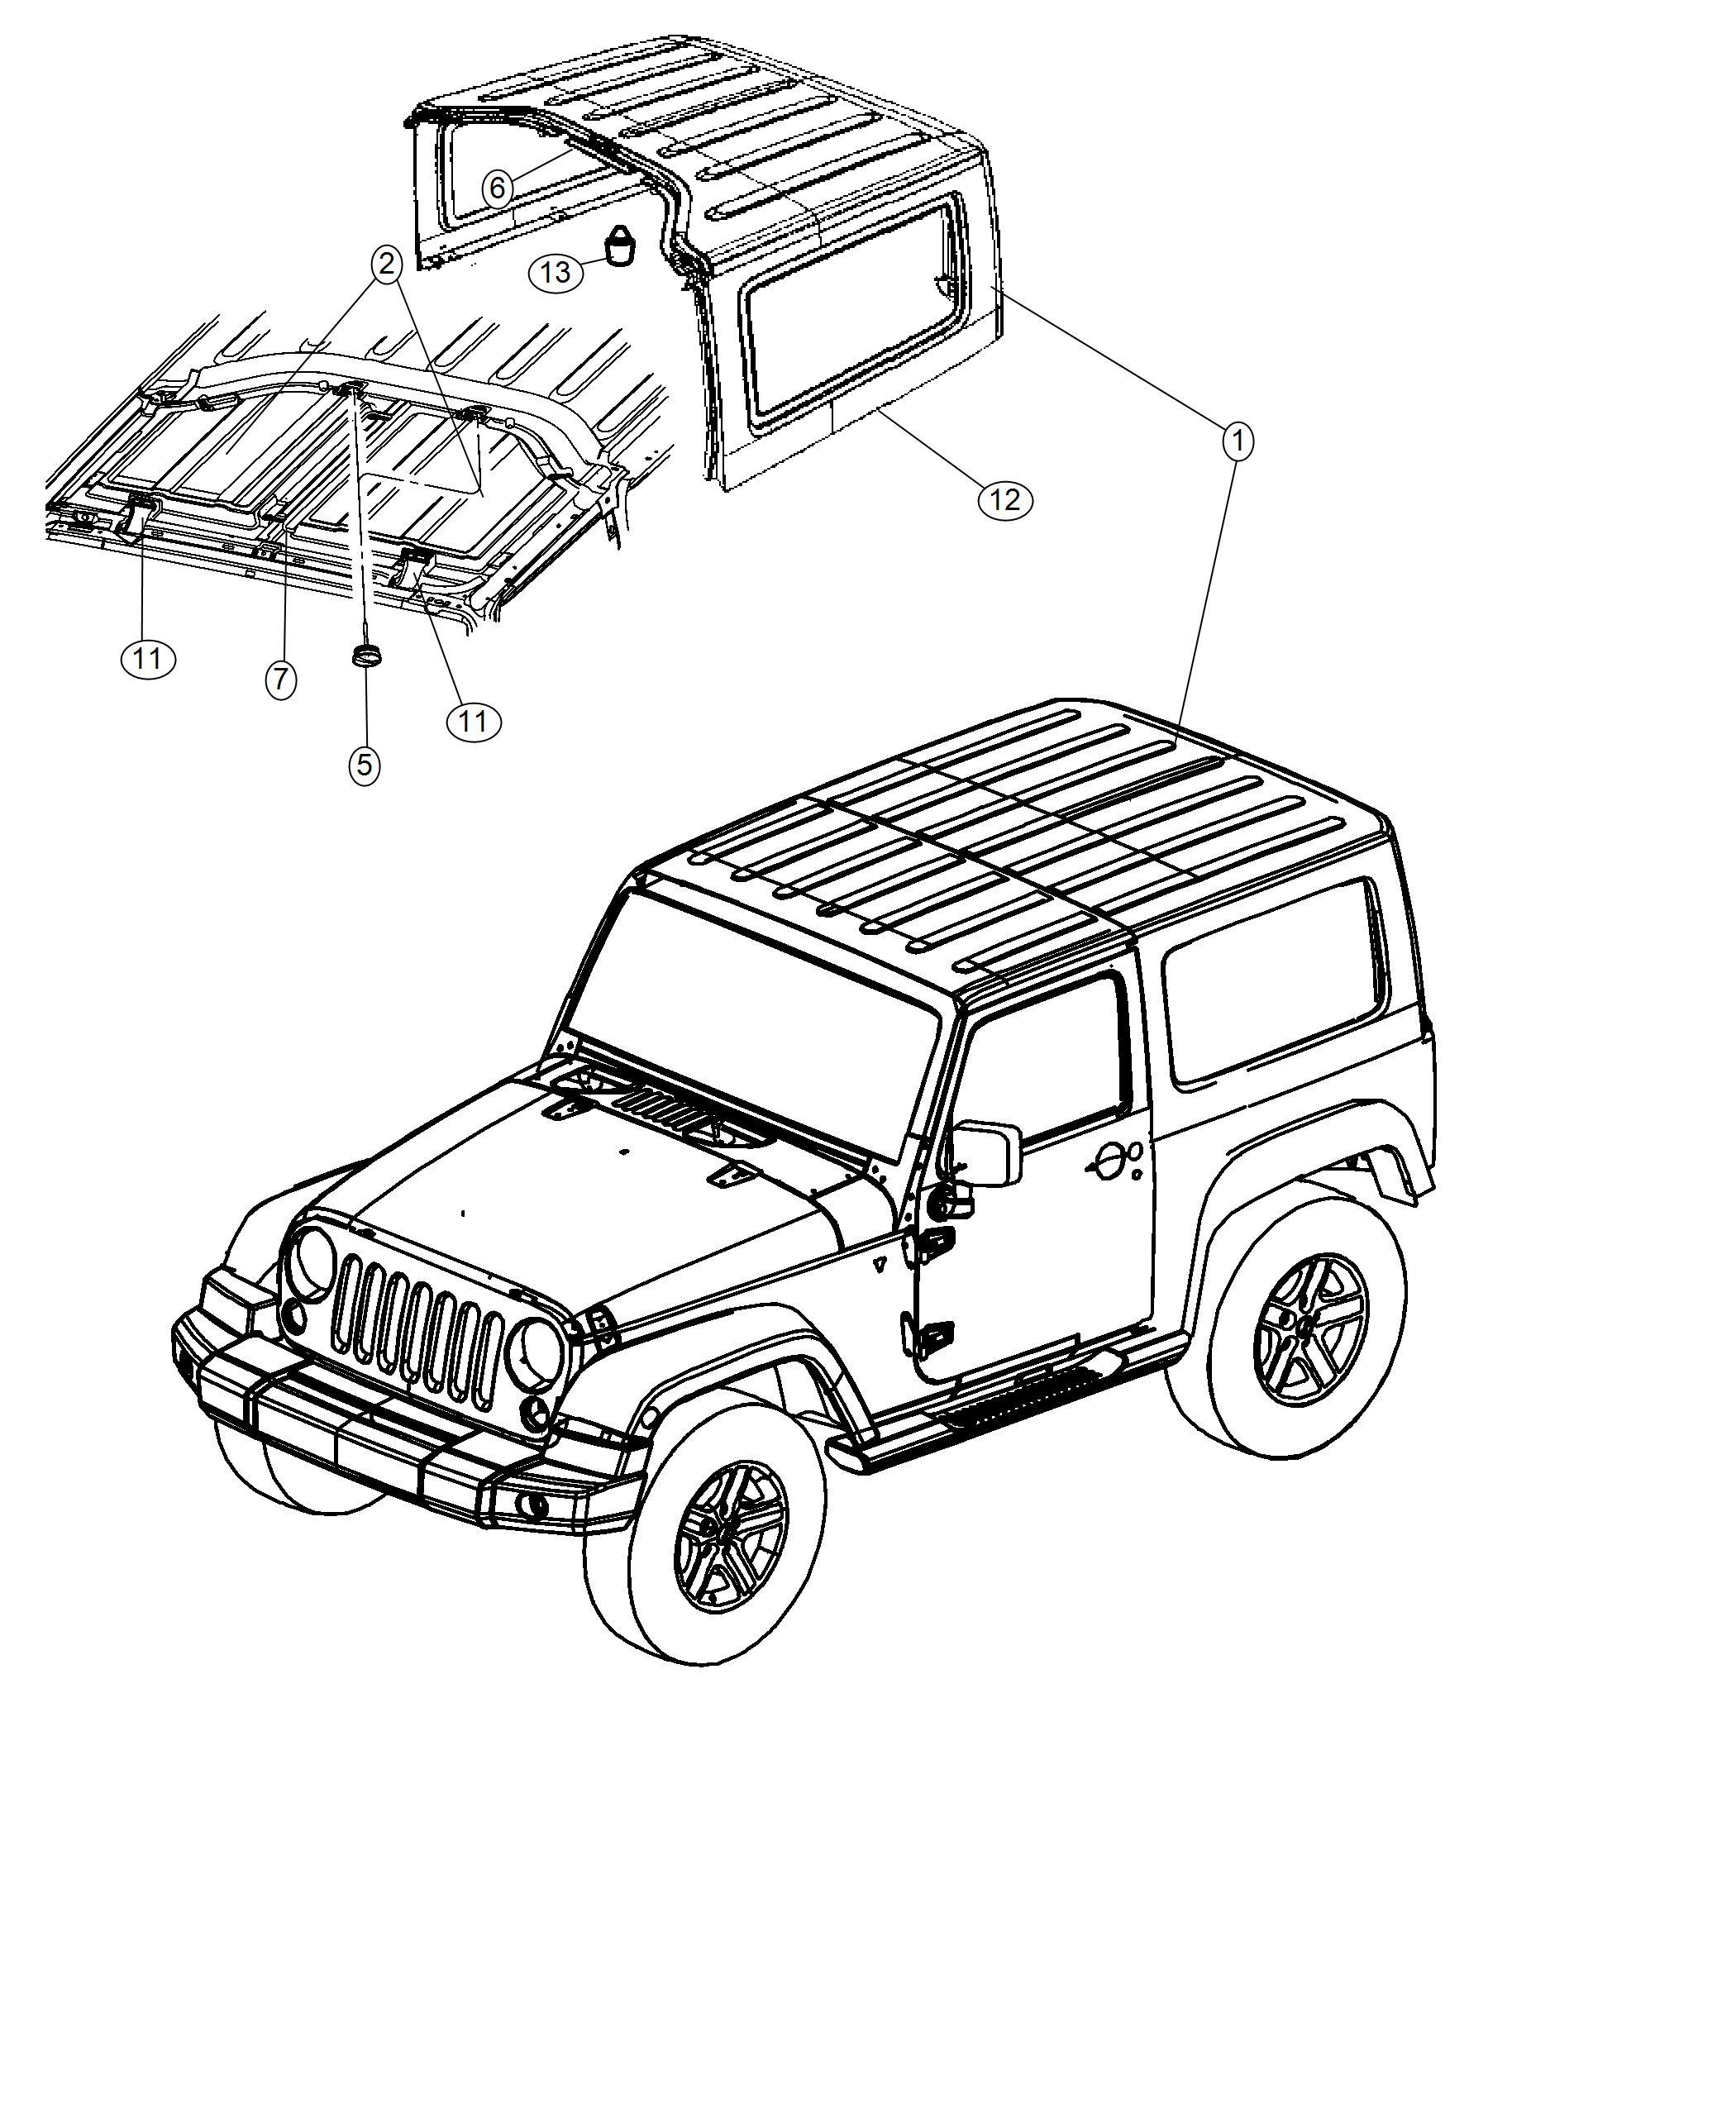 Jeep Wrangler Hardtop Color No Description Available Exterior Acid Yellow Clear